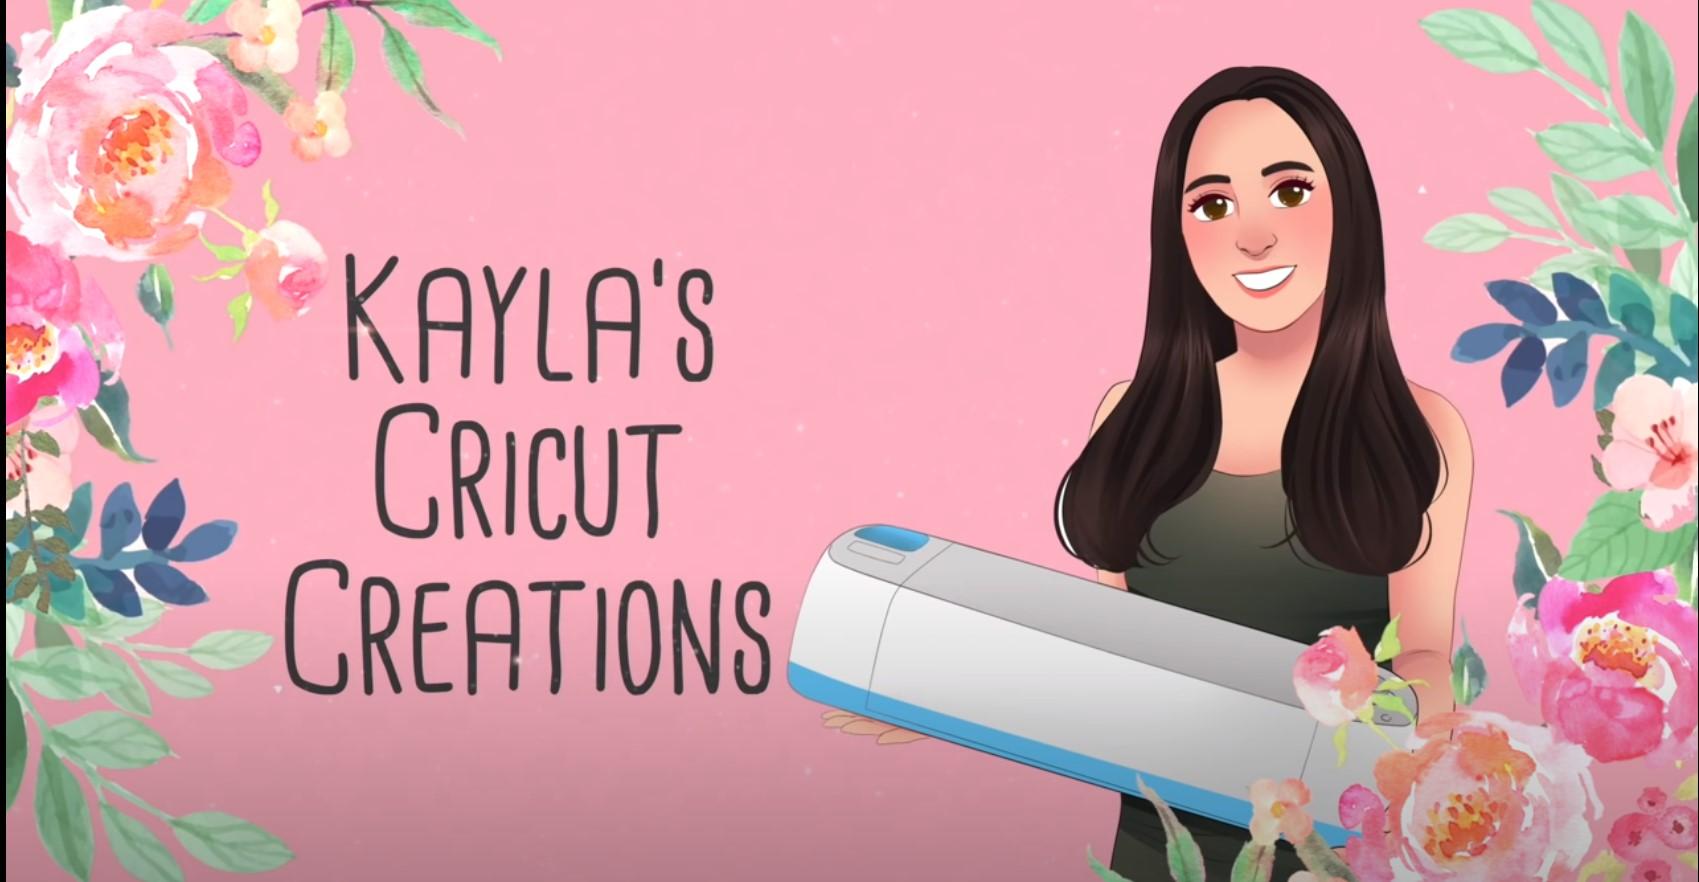 Layla's Cricut Creations YouTube video